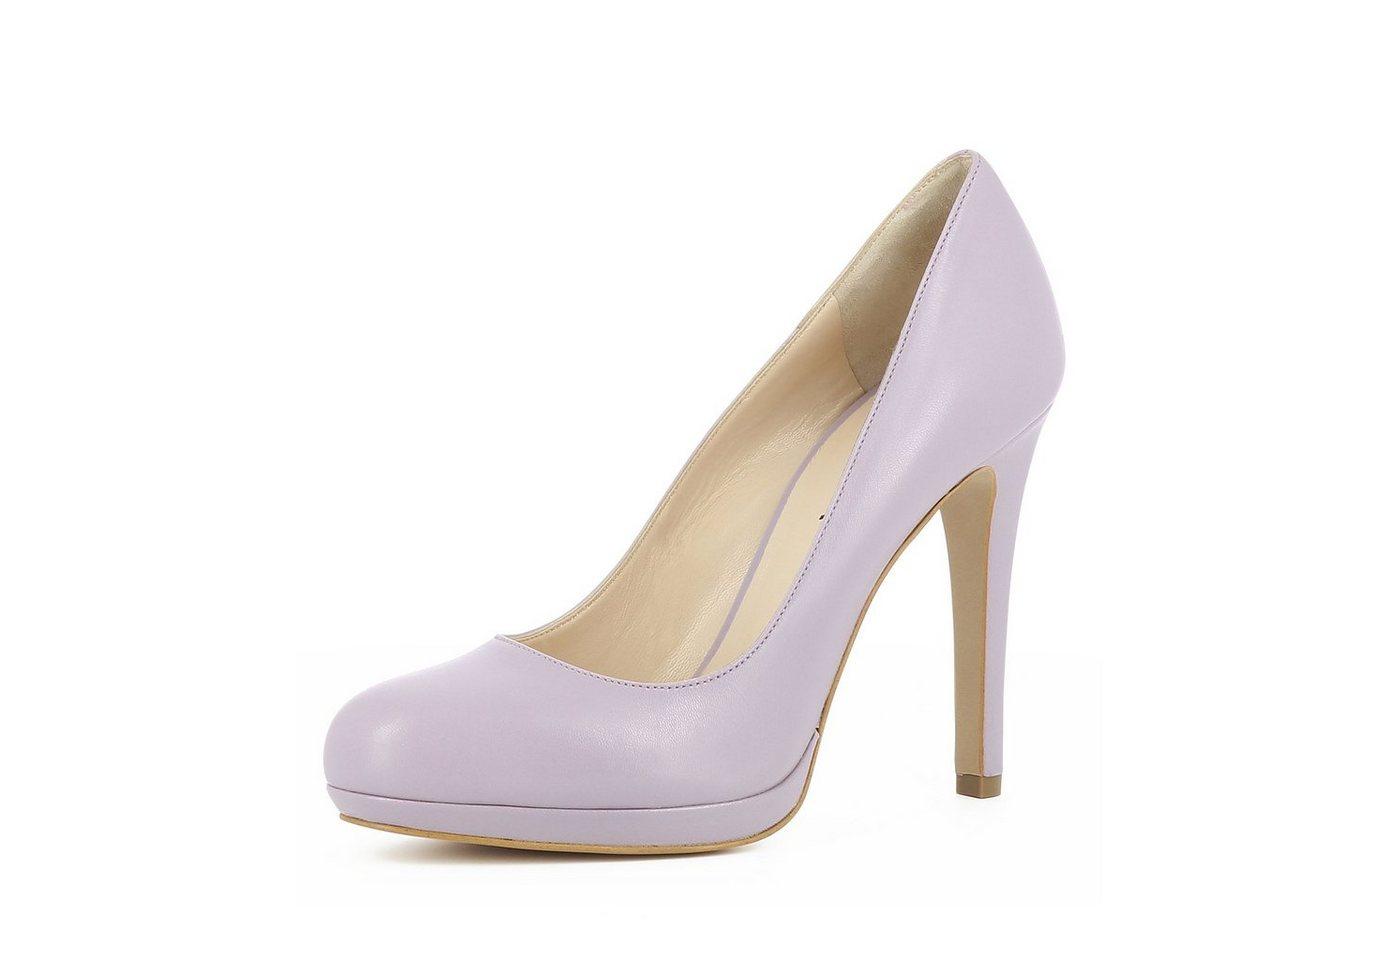 Evita »CRISTINA« Plateaupumps   Schuhe > Pumps > Plateaupumps   Lila   Evita